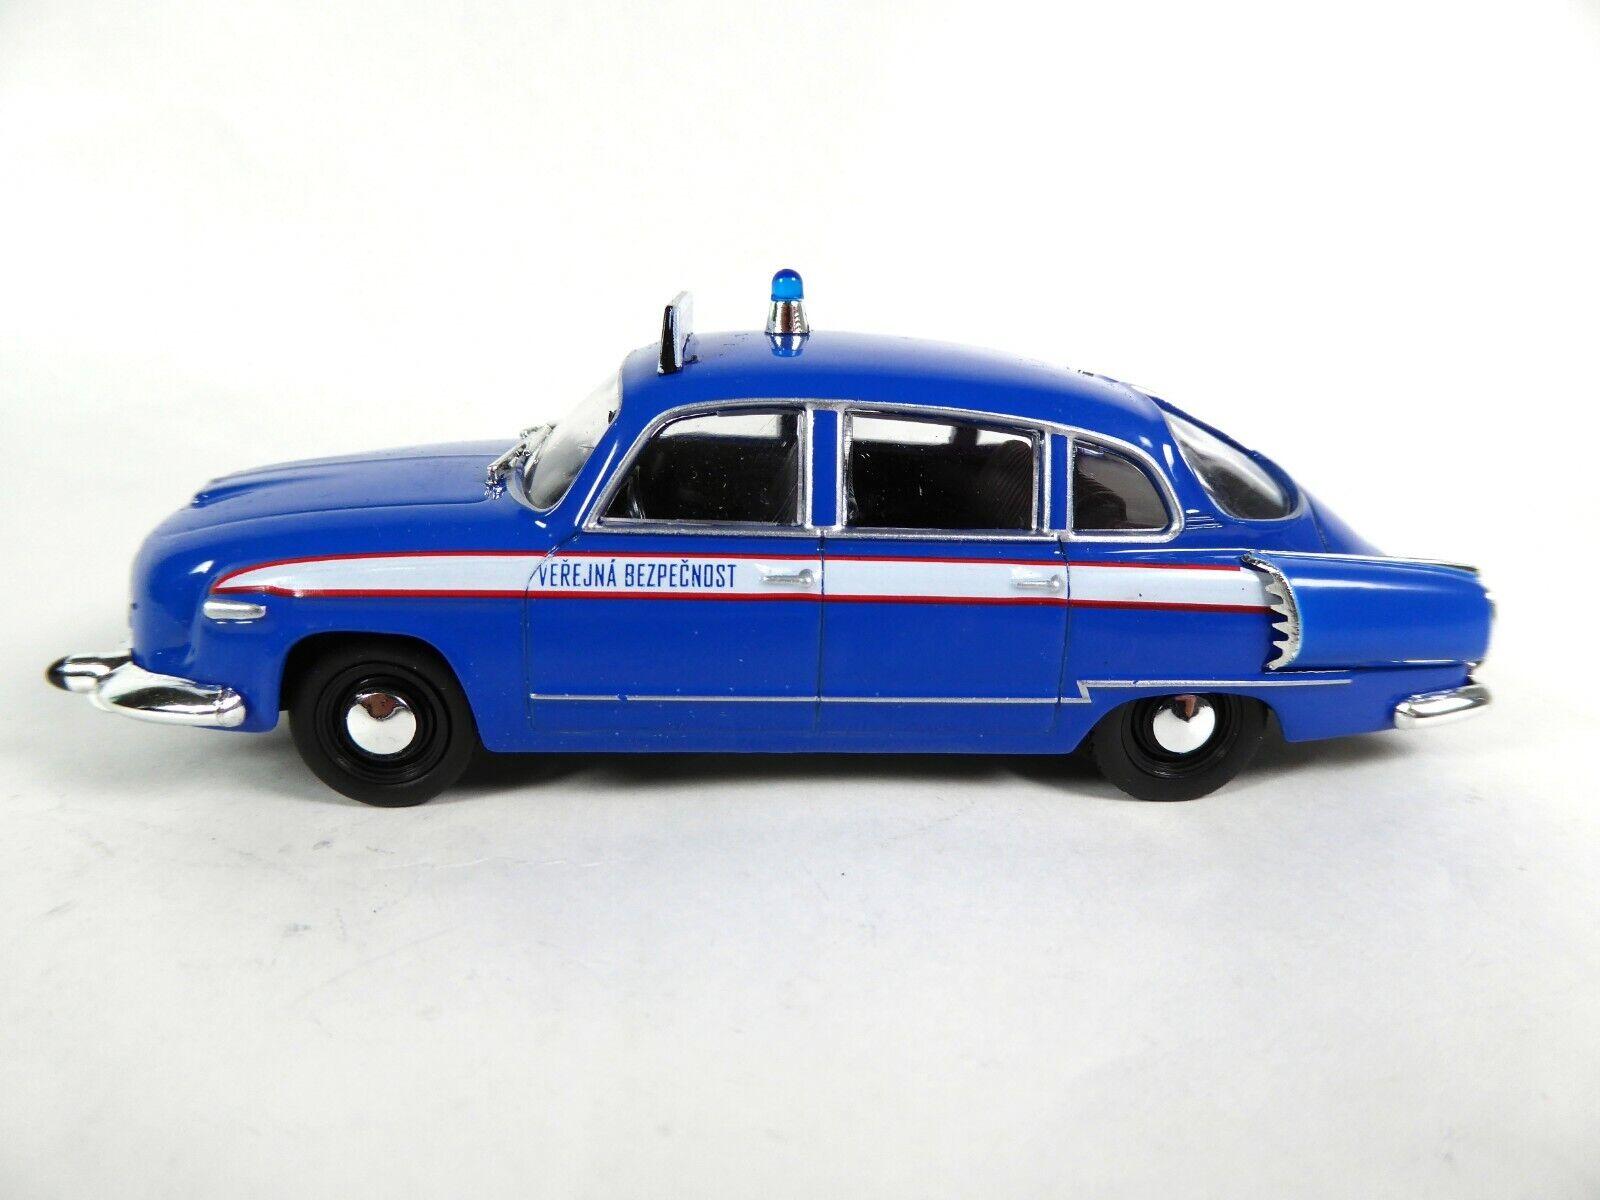 Tatra 603 Police Tchèque - 1 43 - Ist Voiture miniature Diecast PM43